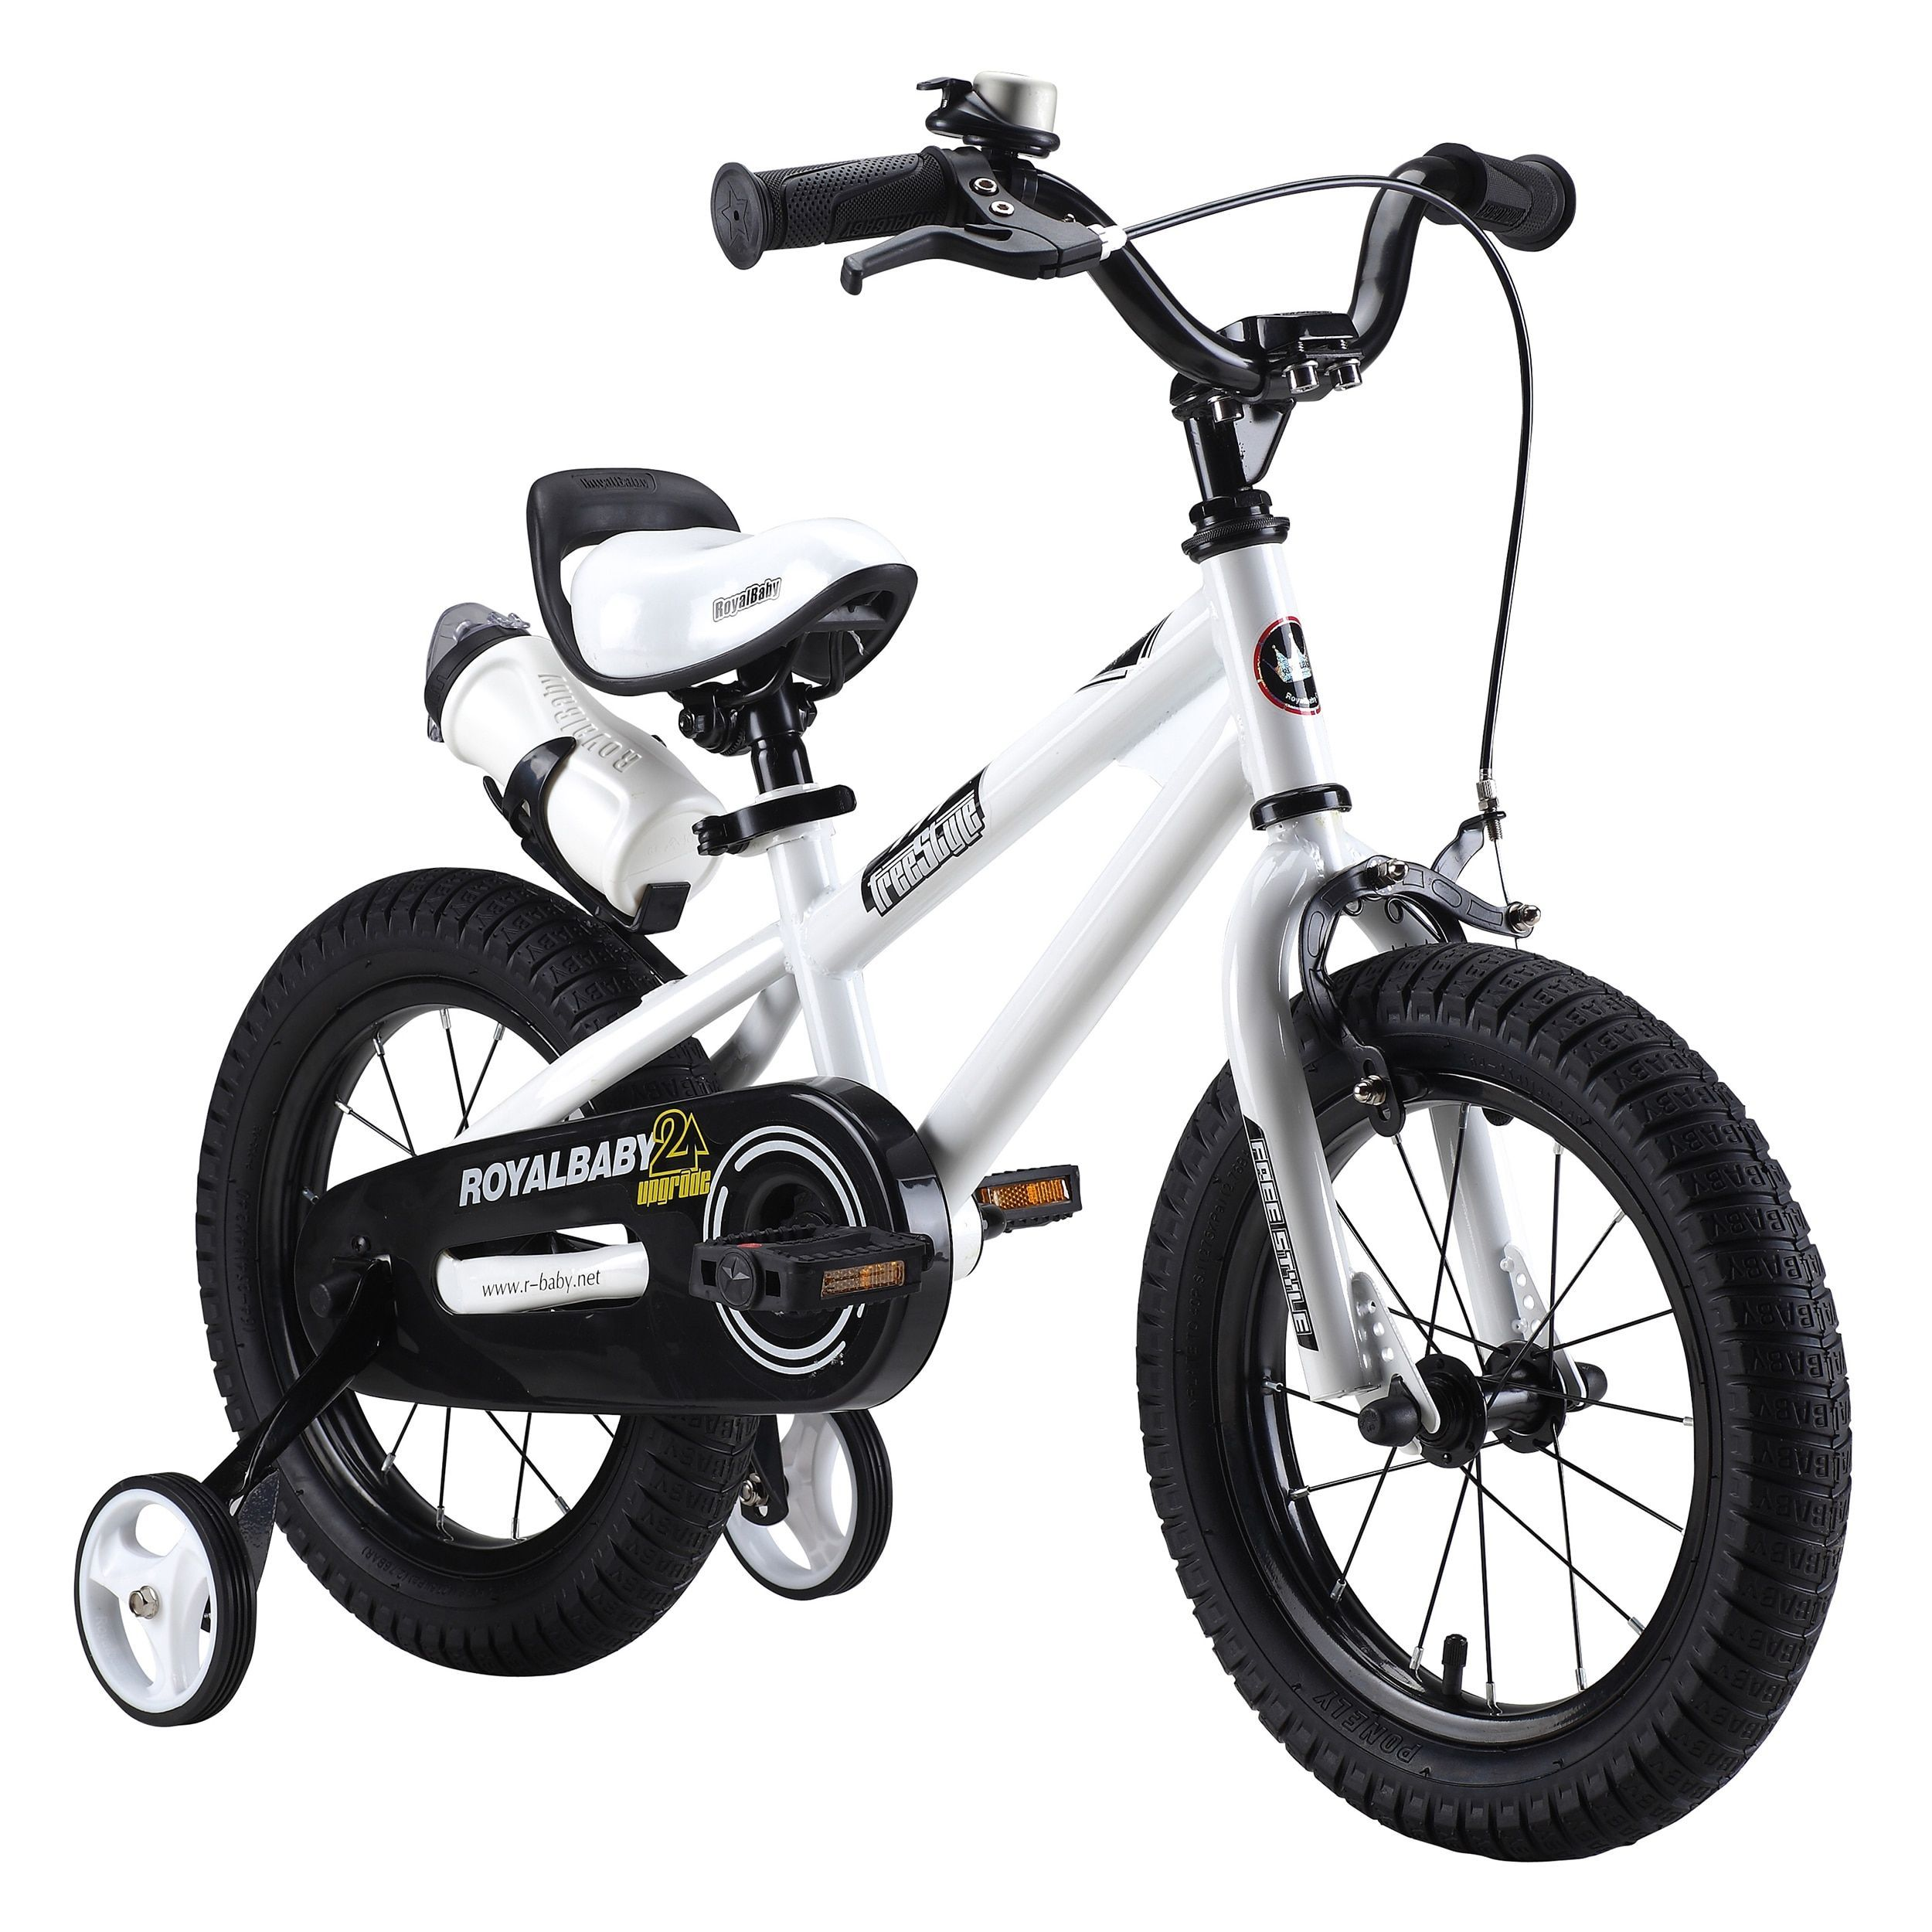 Royalbaby Kids Steel Plastic 16 Inch Bmx Freestyle Bike With